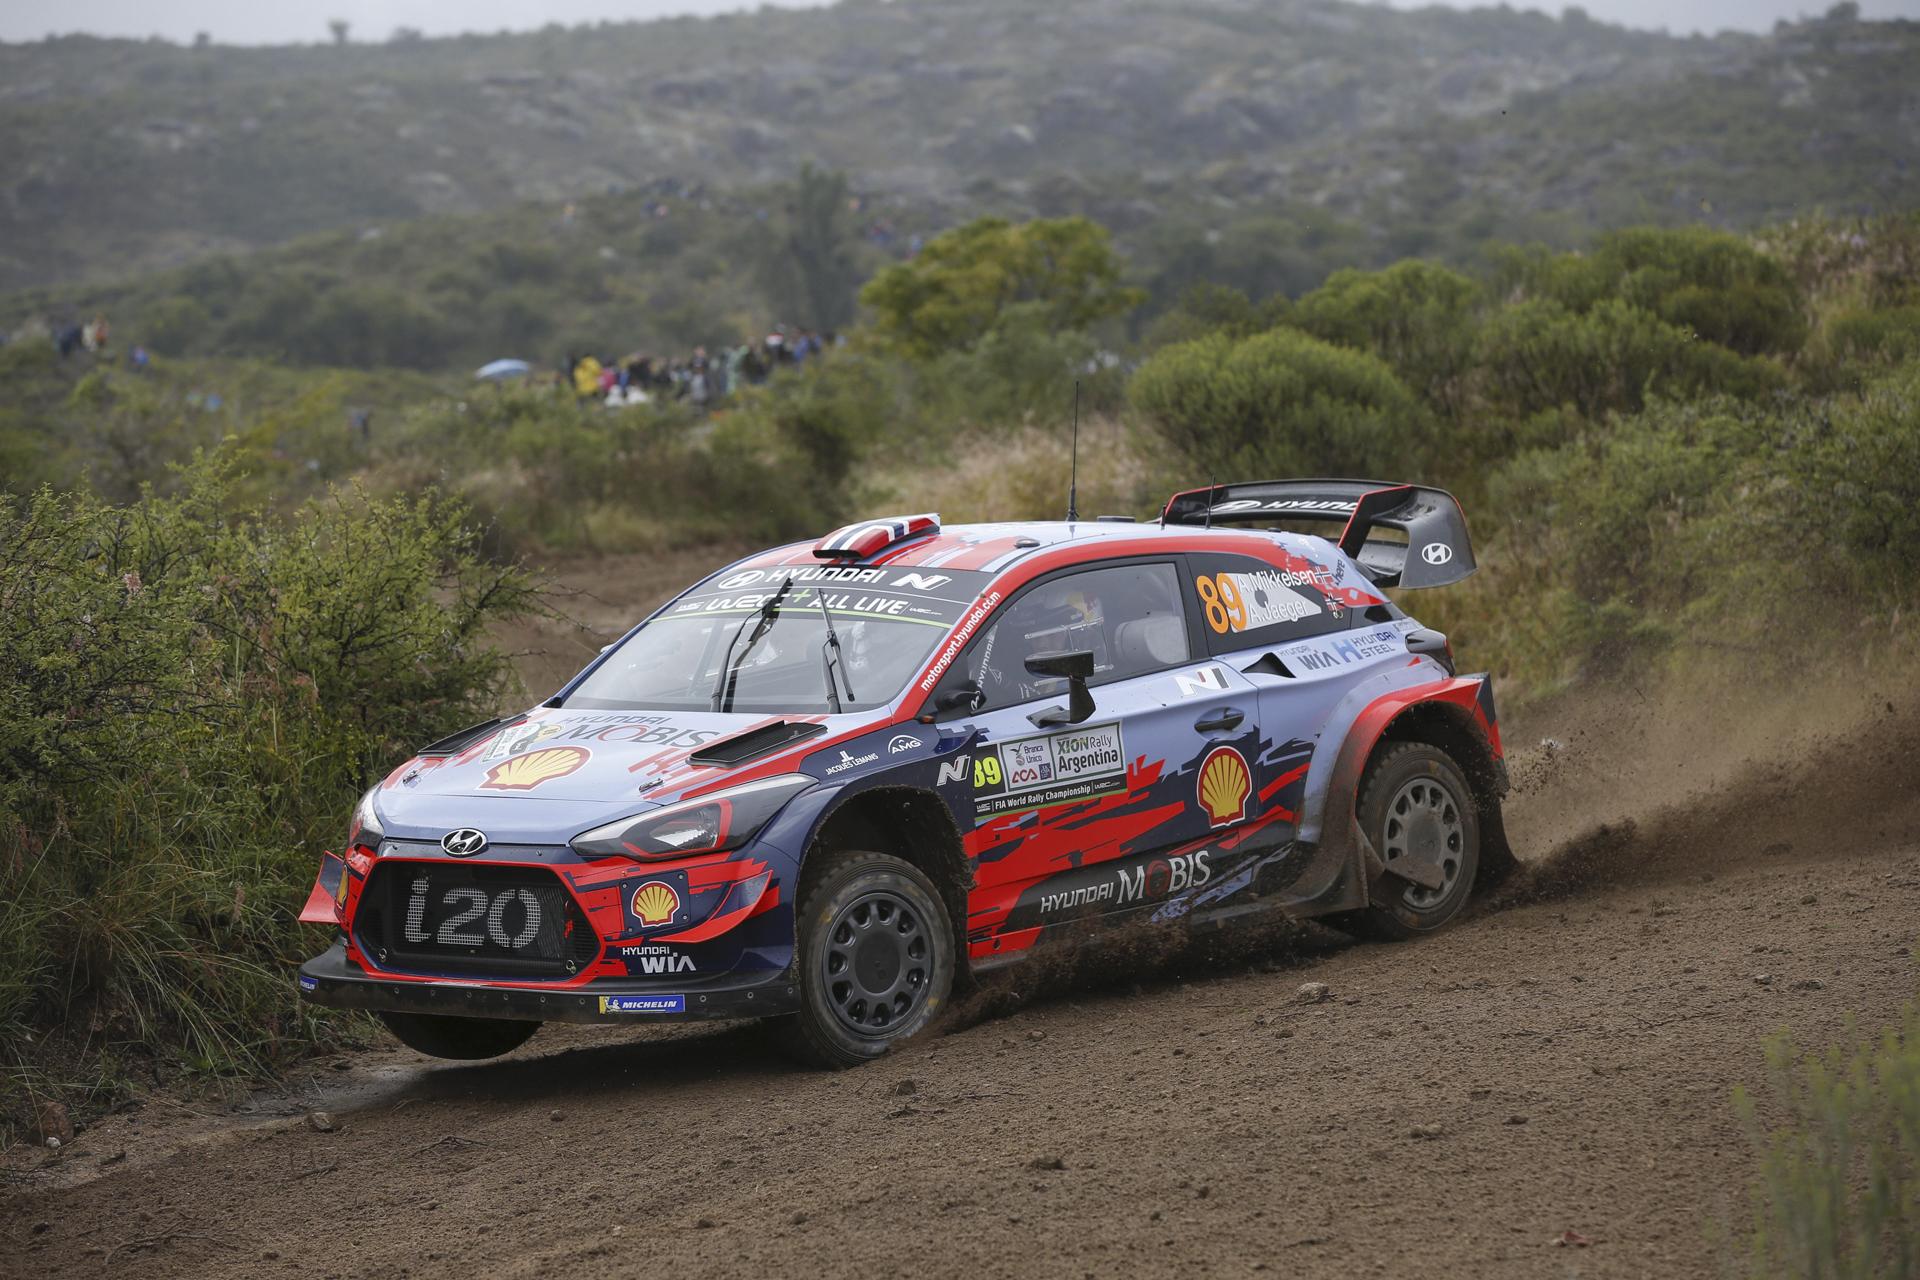 HyundaiMotorsport_RallyArgentina_Dia1_Mikkelsen